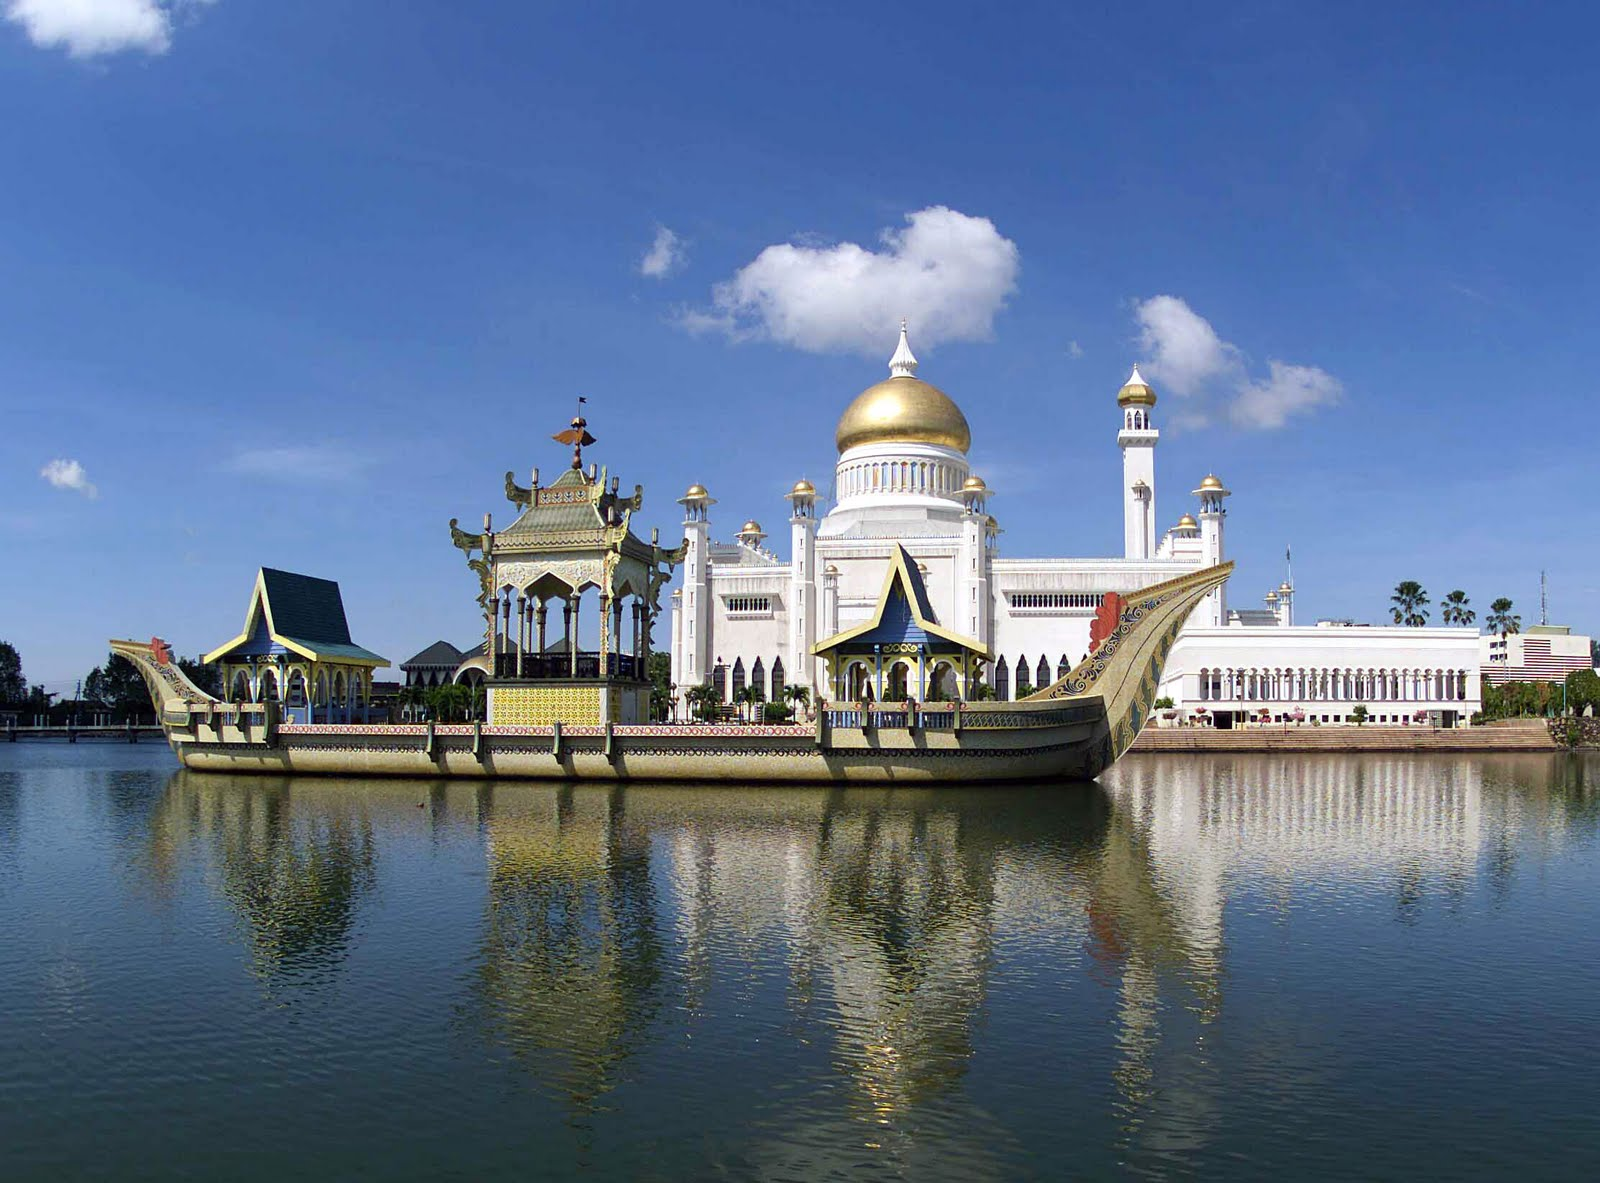 brunei - sultan omar ali saifuddin mosque.jpg